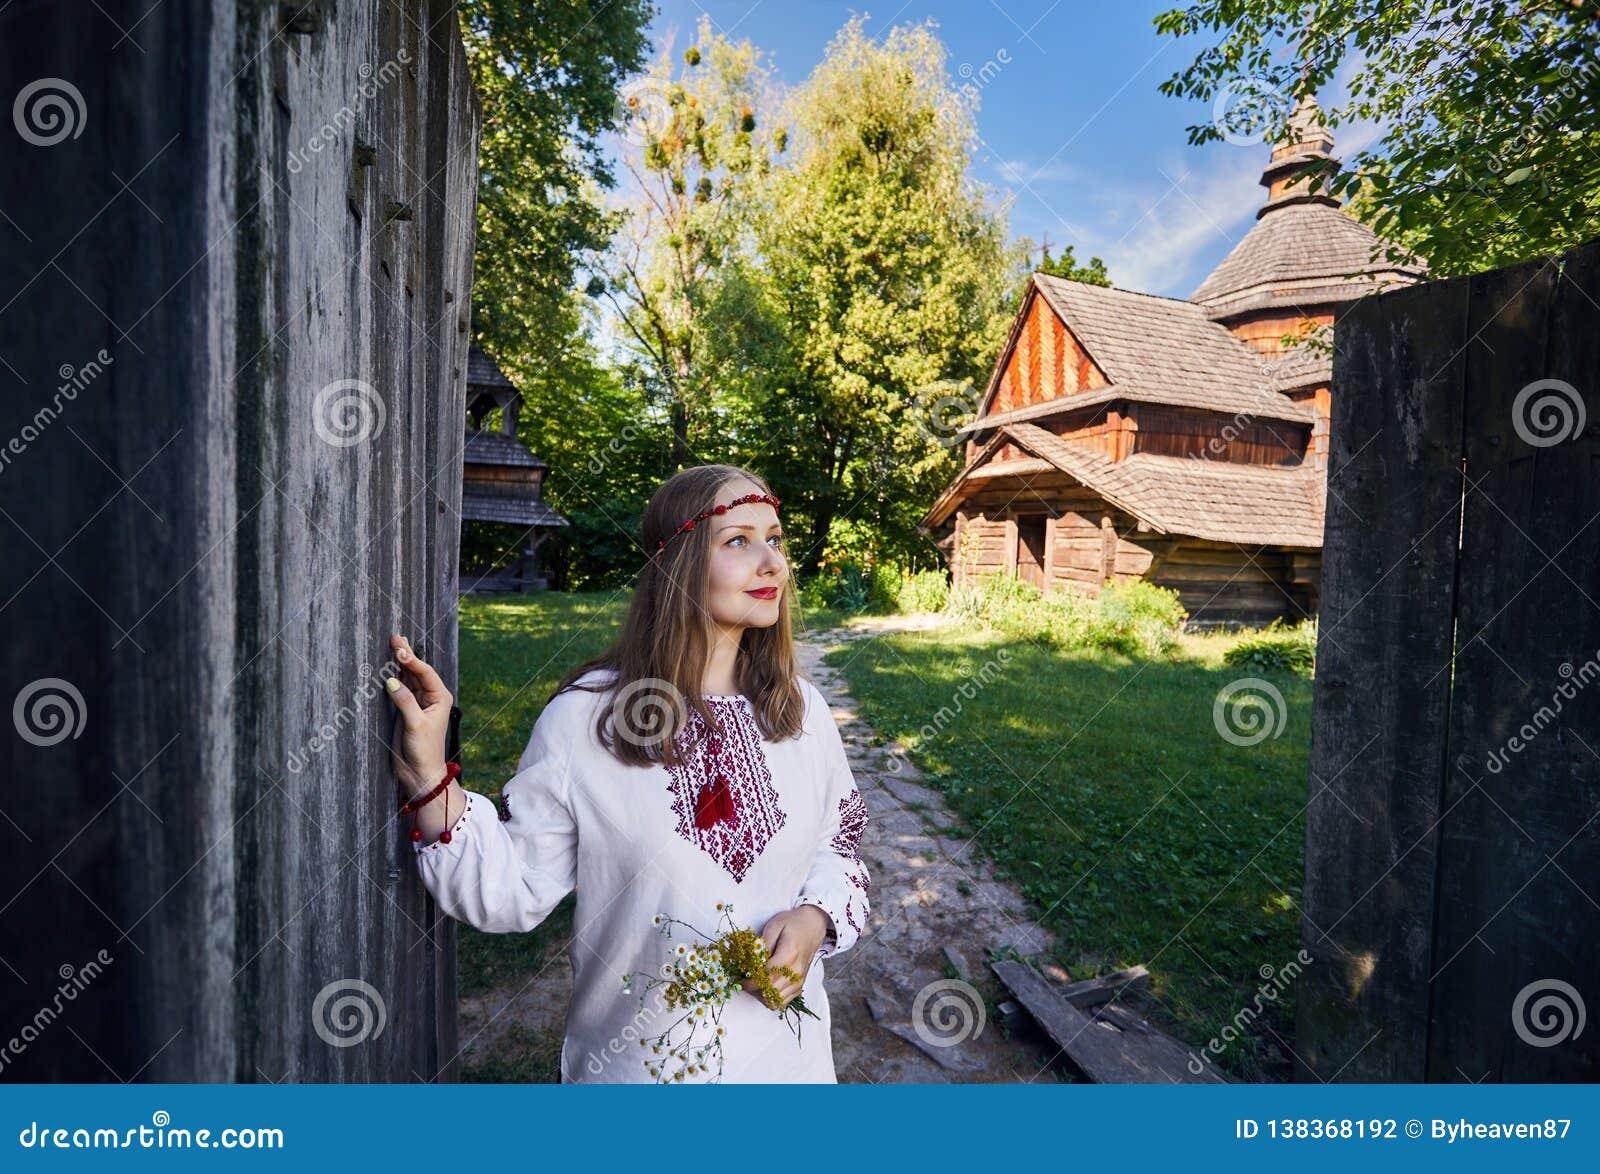 Ukrainian woman in ethnic village